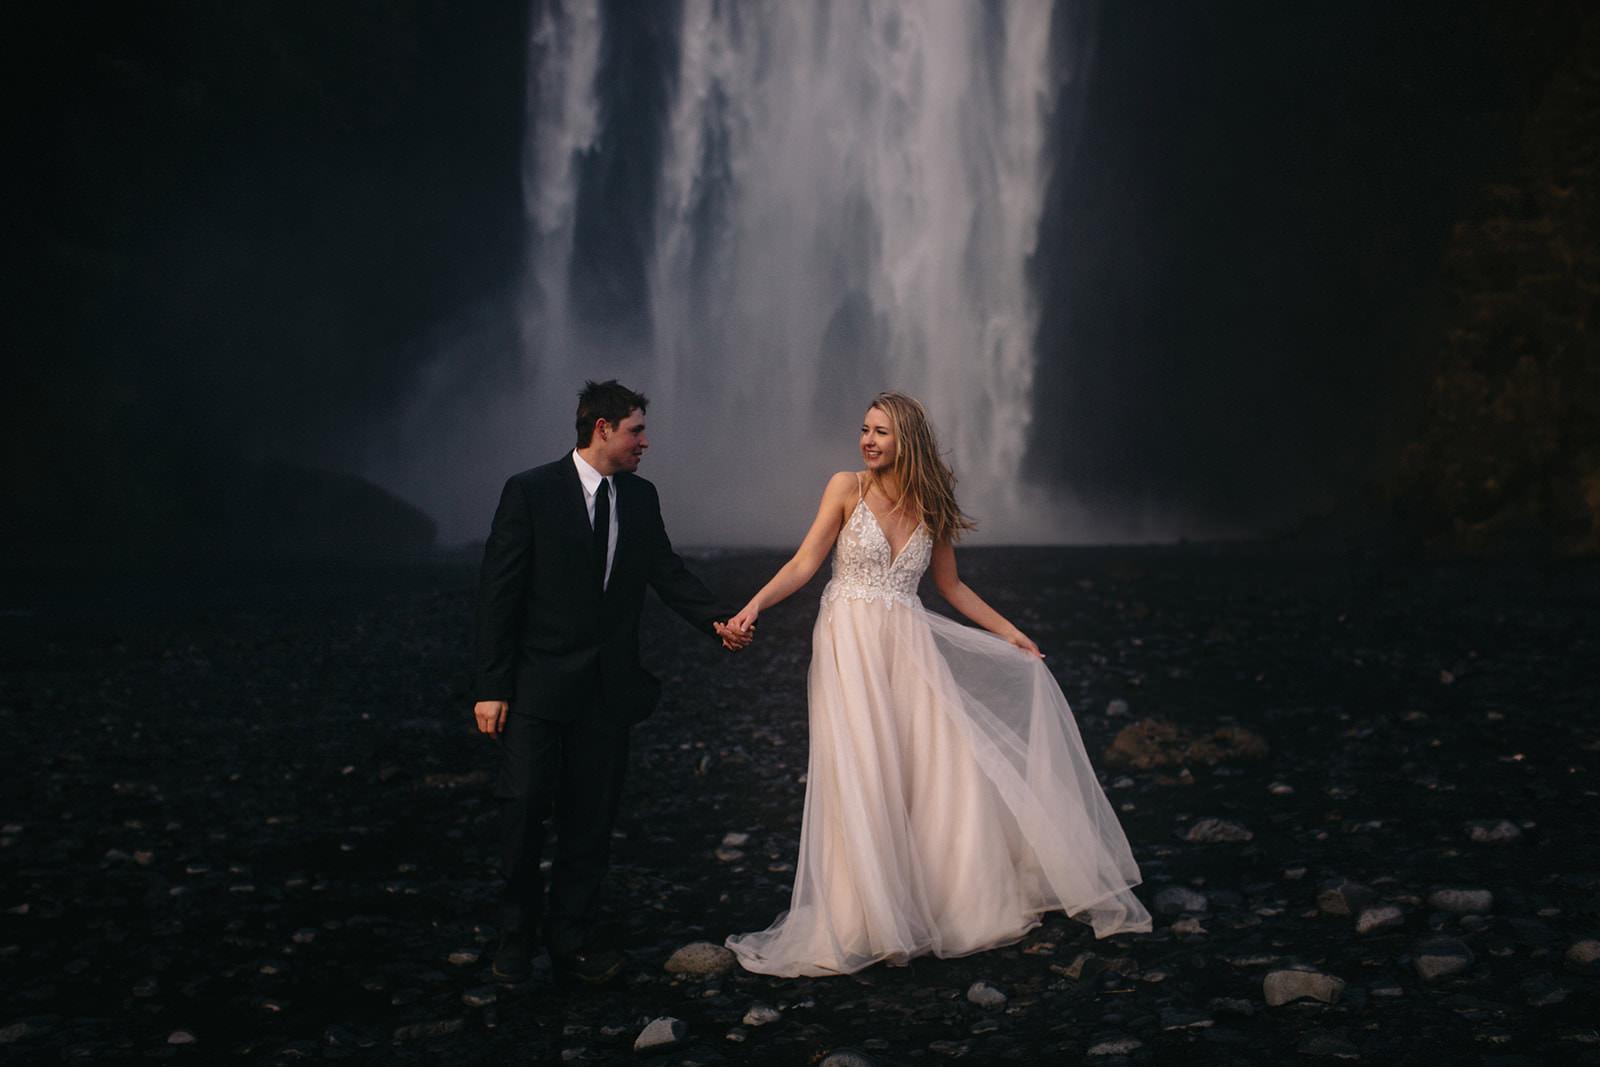 Icelandic Iceland Elopement Wedding Elope Photographer Eloping Reykjavík Vik Black Sand Beach Jökulsárlón Skogafoss Waterfall Vestrahorn Mountain Liz Osban Photography Destination 109.jpg